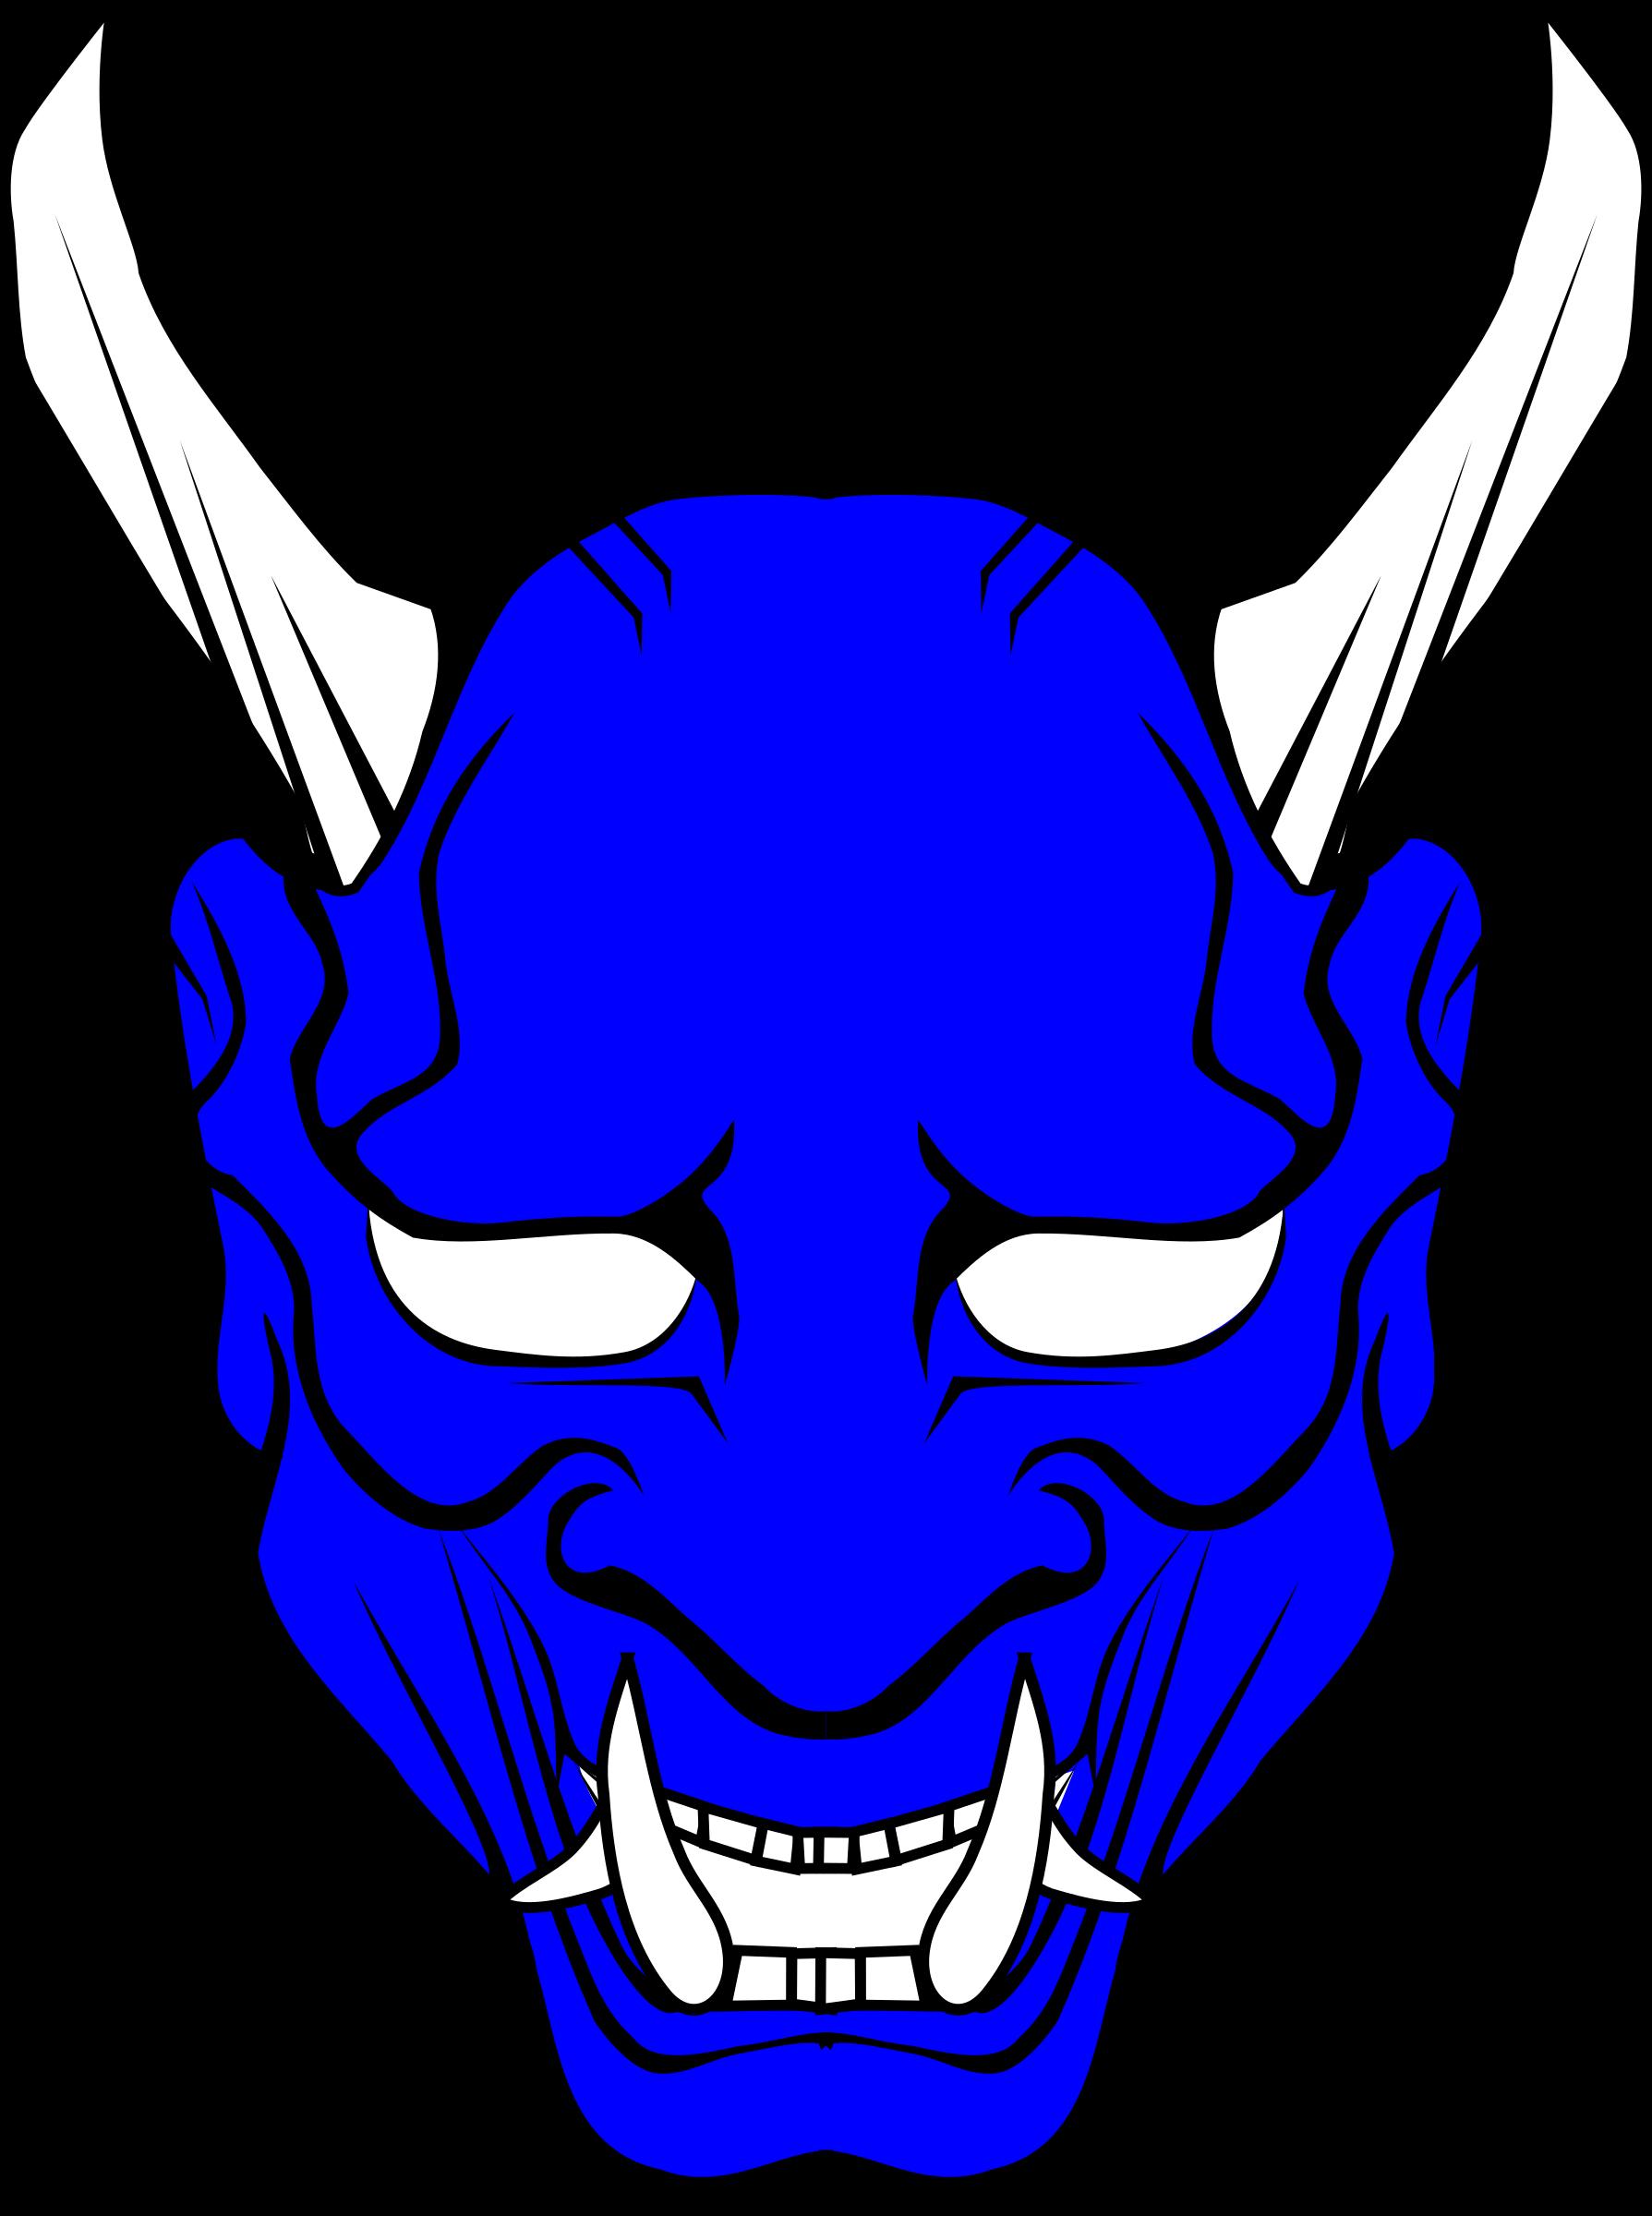 Mask clipart symbol. Oni big image png